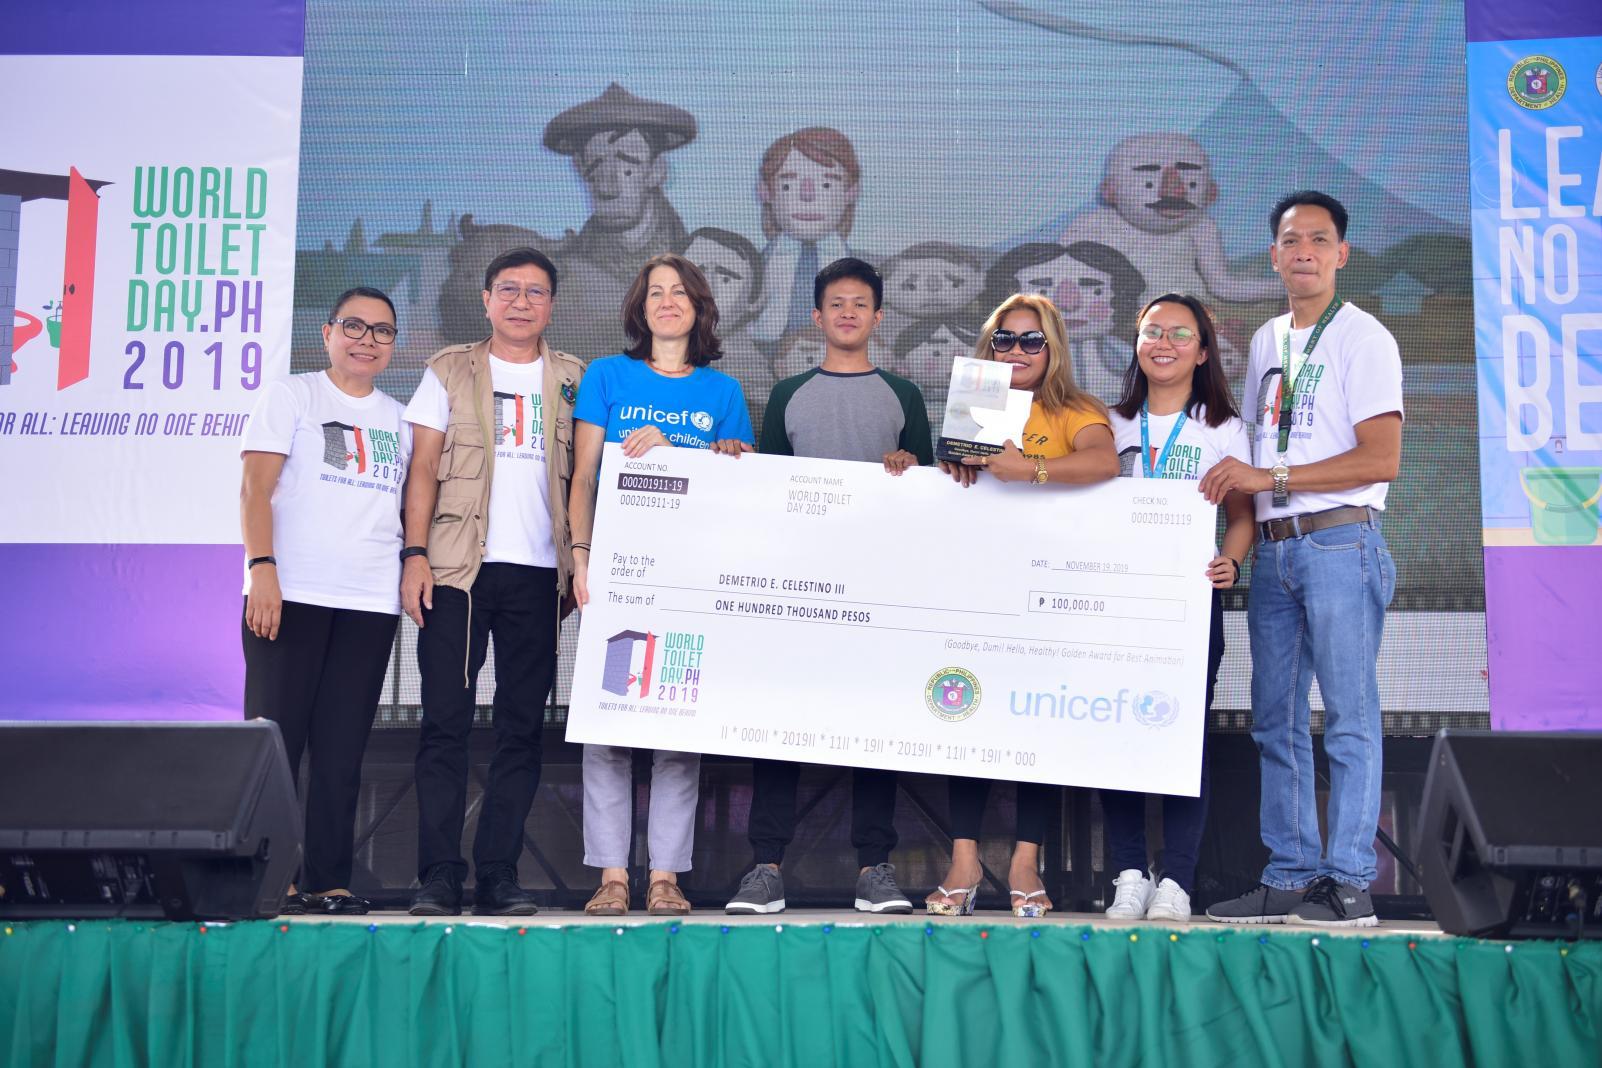 UNICEF presents award to Demetrio Celestino III